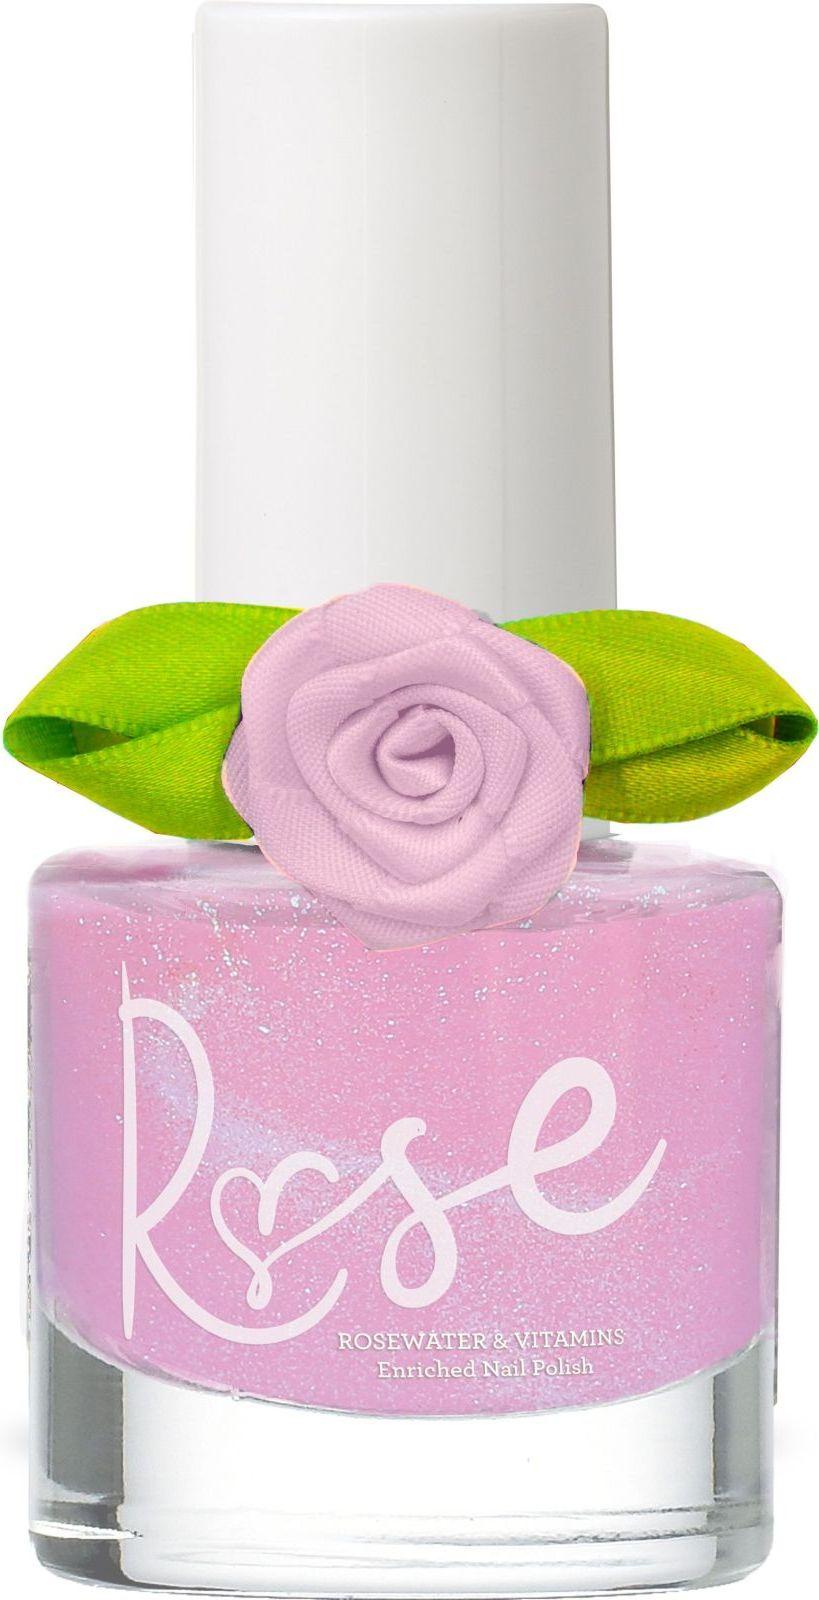 Detsky Lak Na Nehty Snails Rose Nails On Fleek Uni Bembo Cz